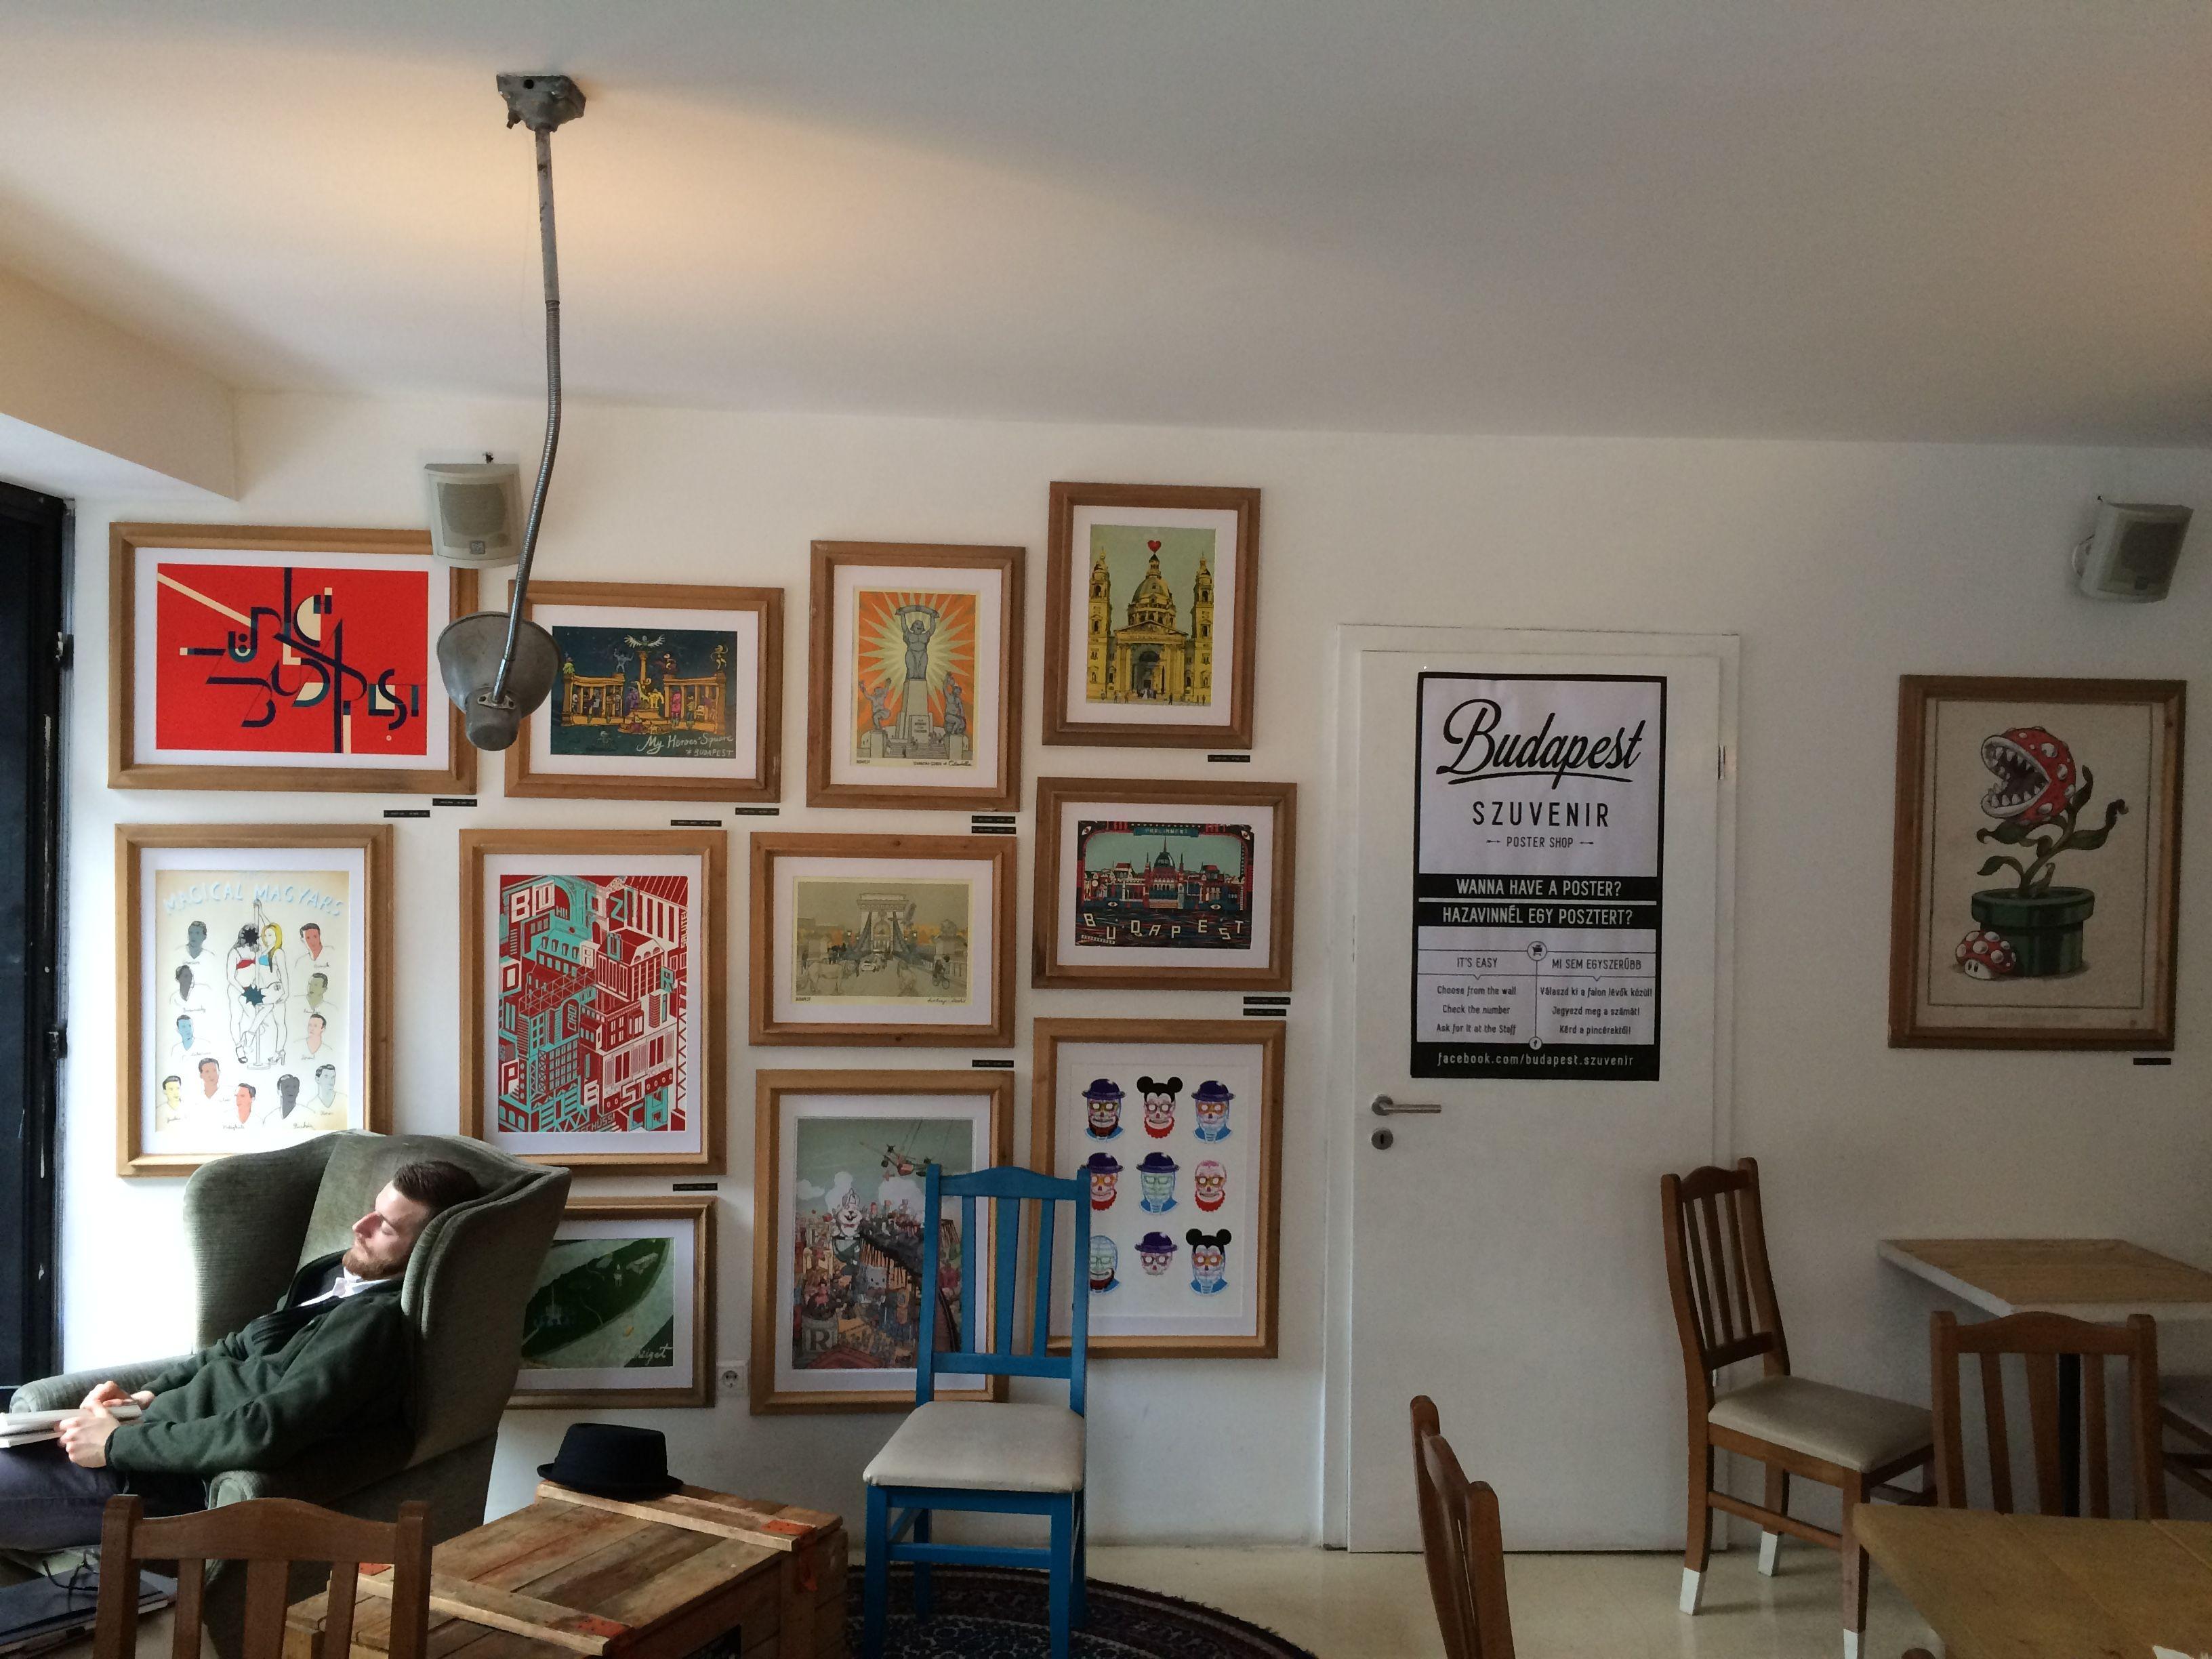 Food/Bistro/Café: Konyha (Madách Imre út 8) - Great café for ...